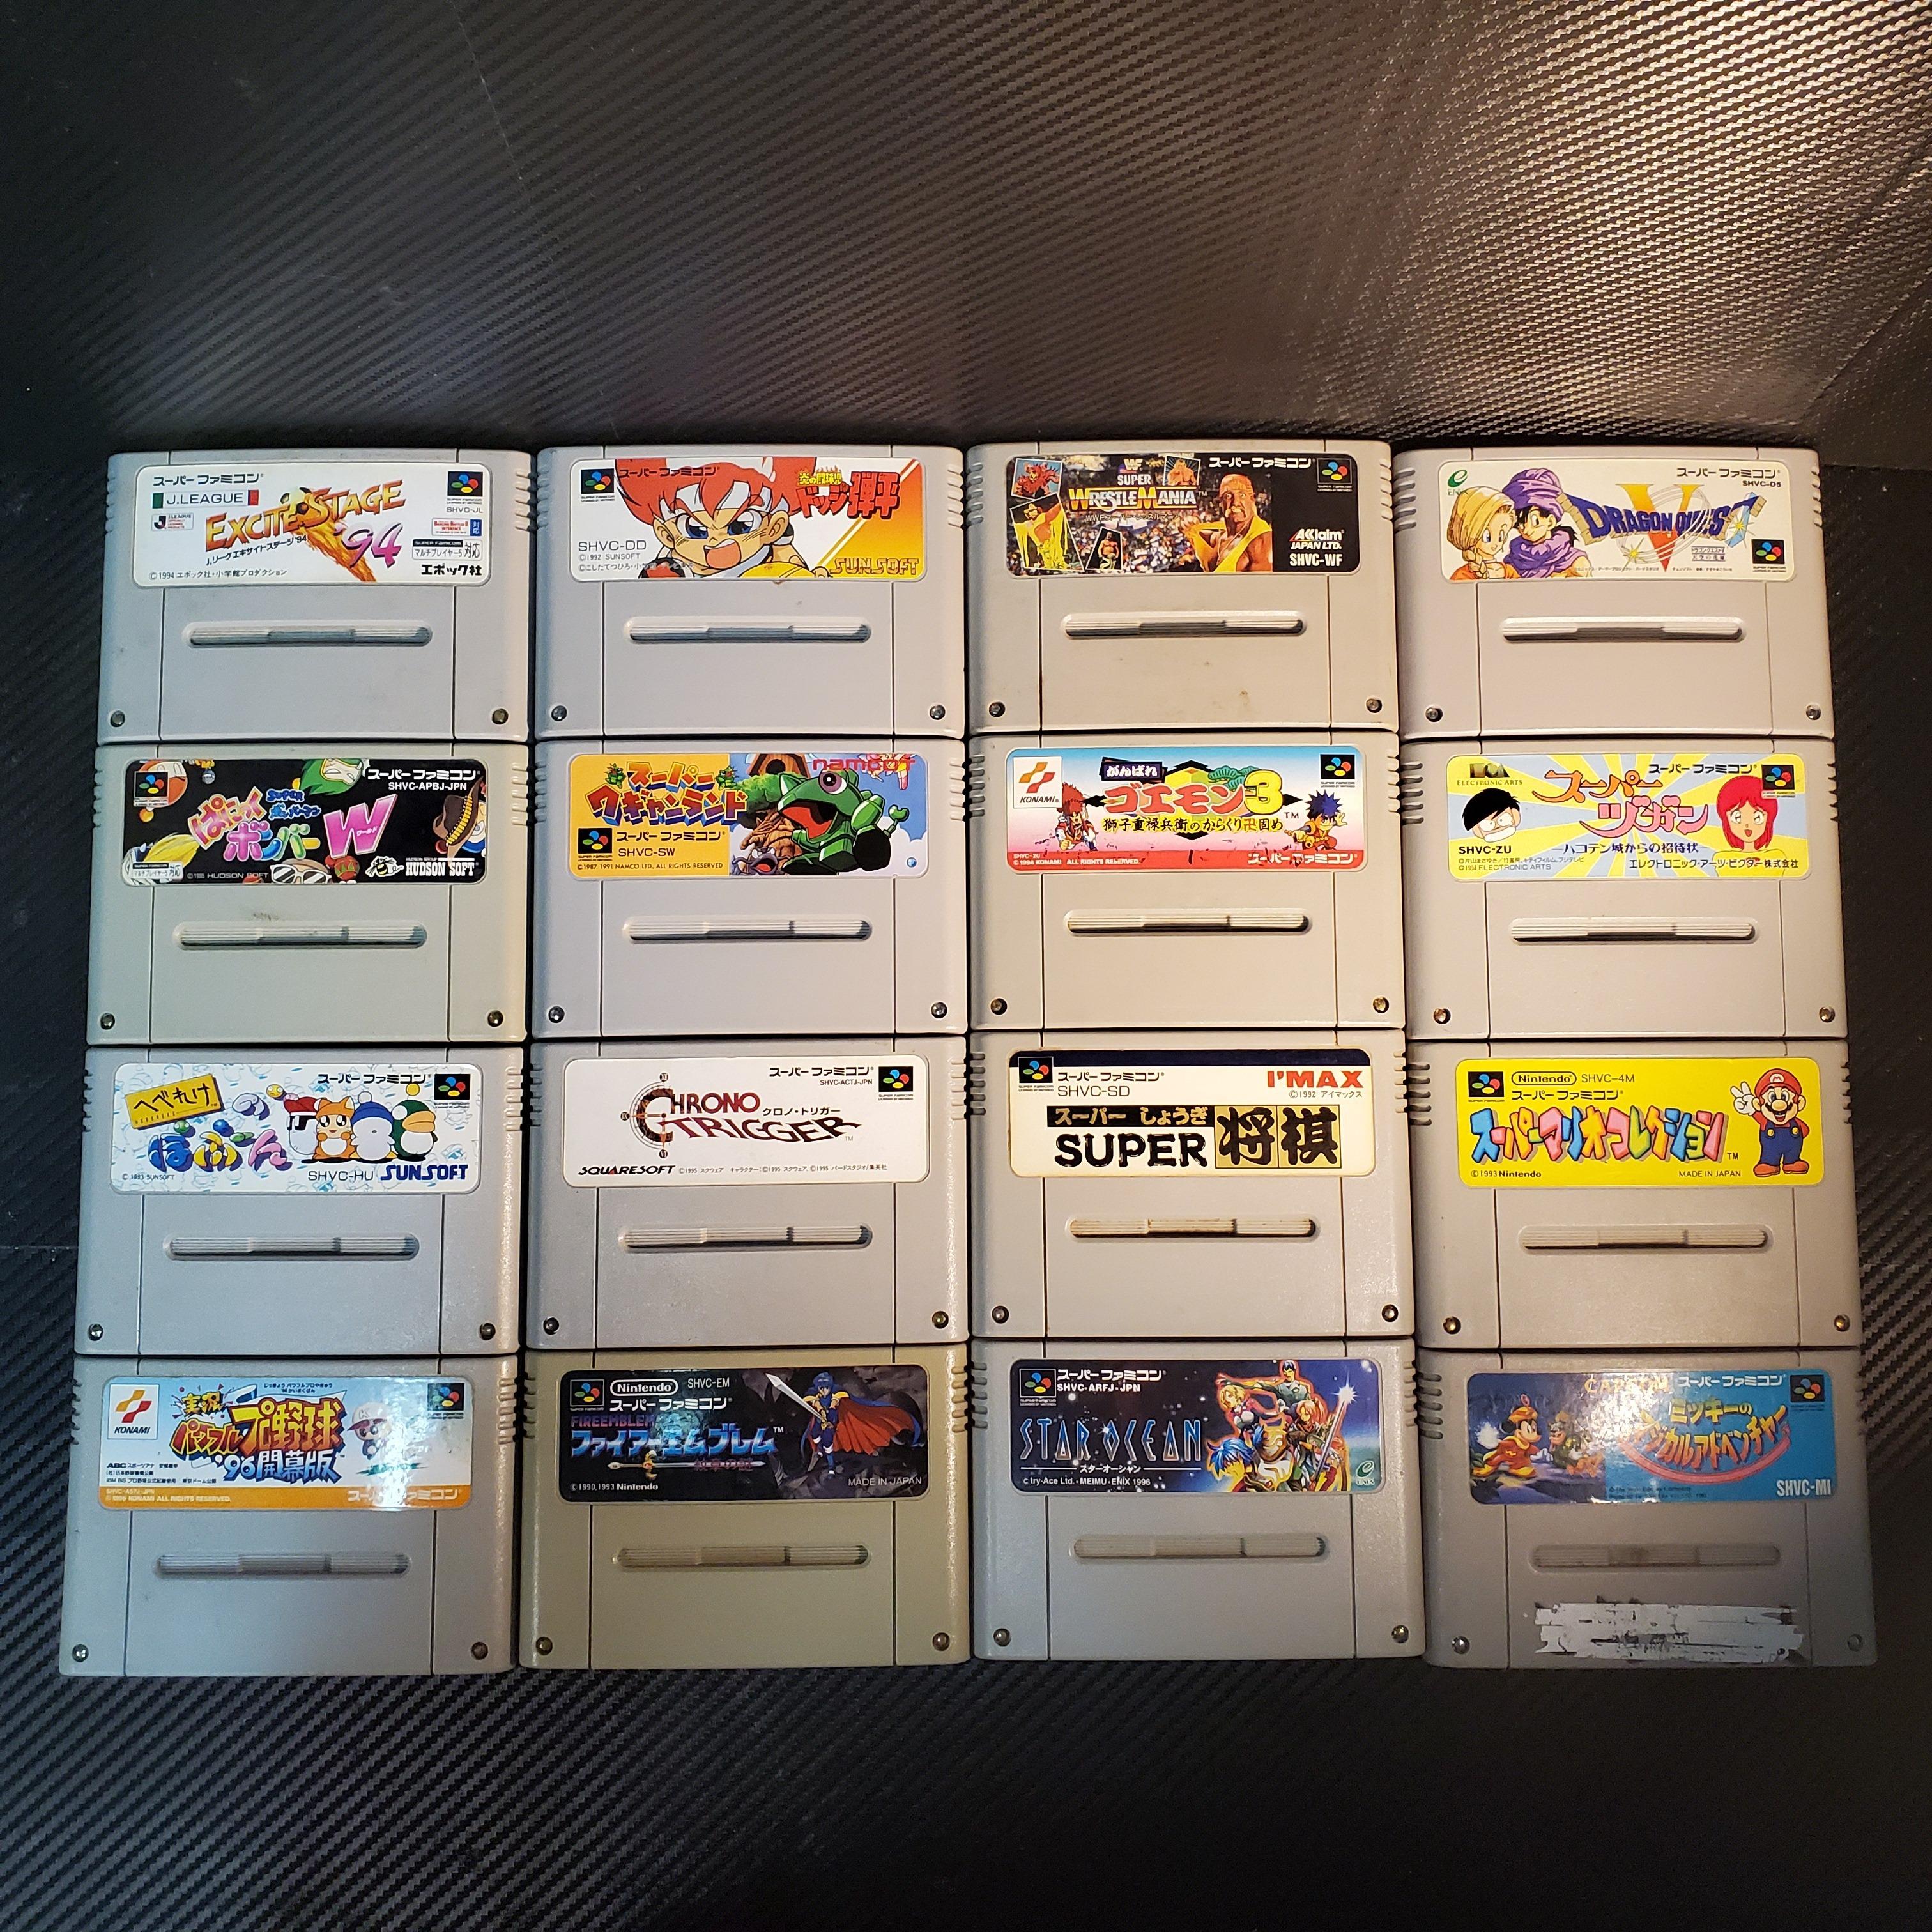 [VDS] Nostalgeek Store — Super Famicom / GBA / GB / Nintendo 64 / GameCube 201005105017250542